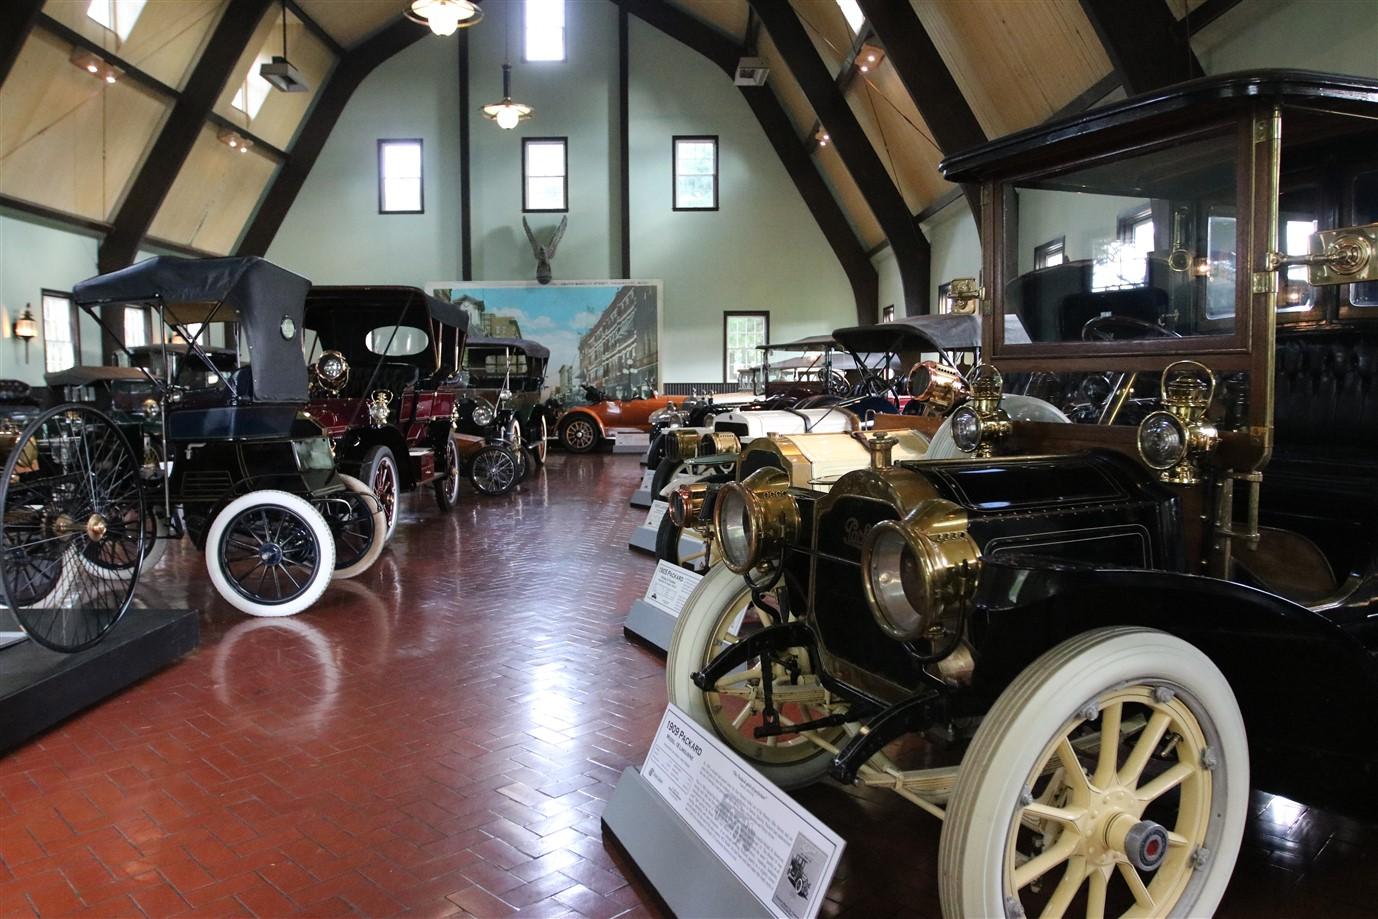 2018 09 03 30 Hickory Corners MI Gilmore Car Museum.jpg